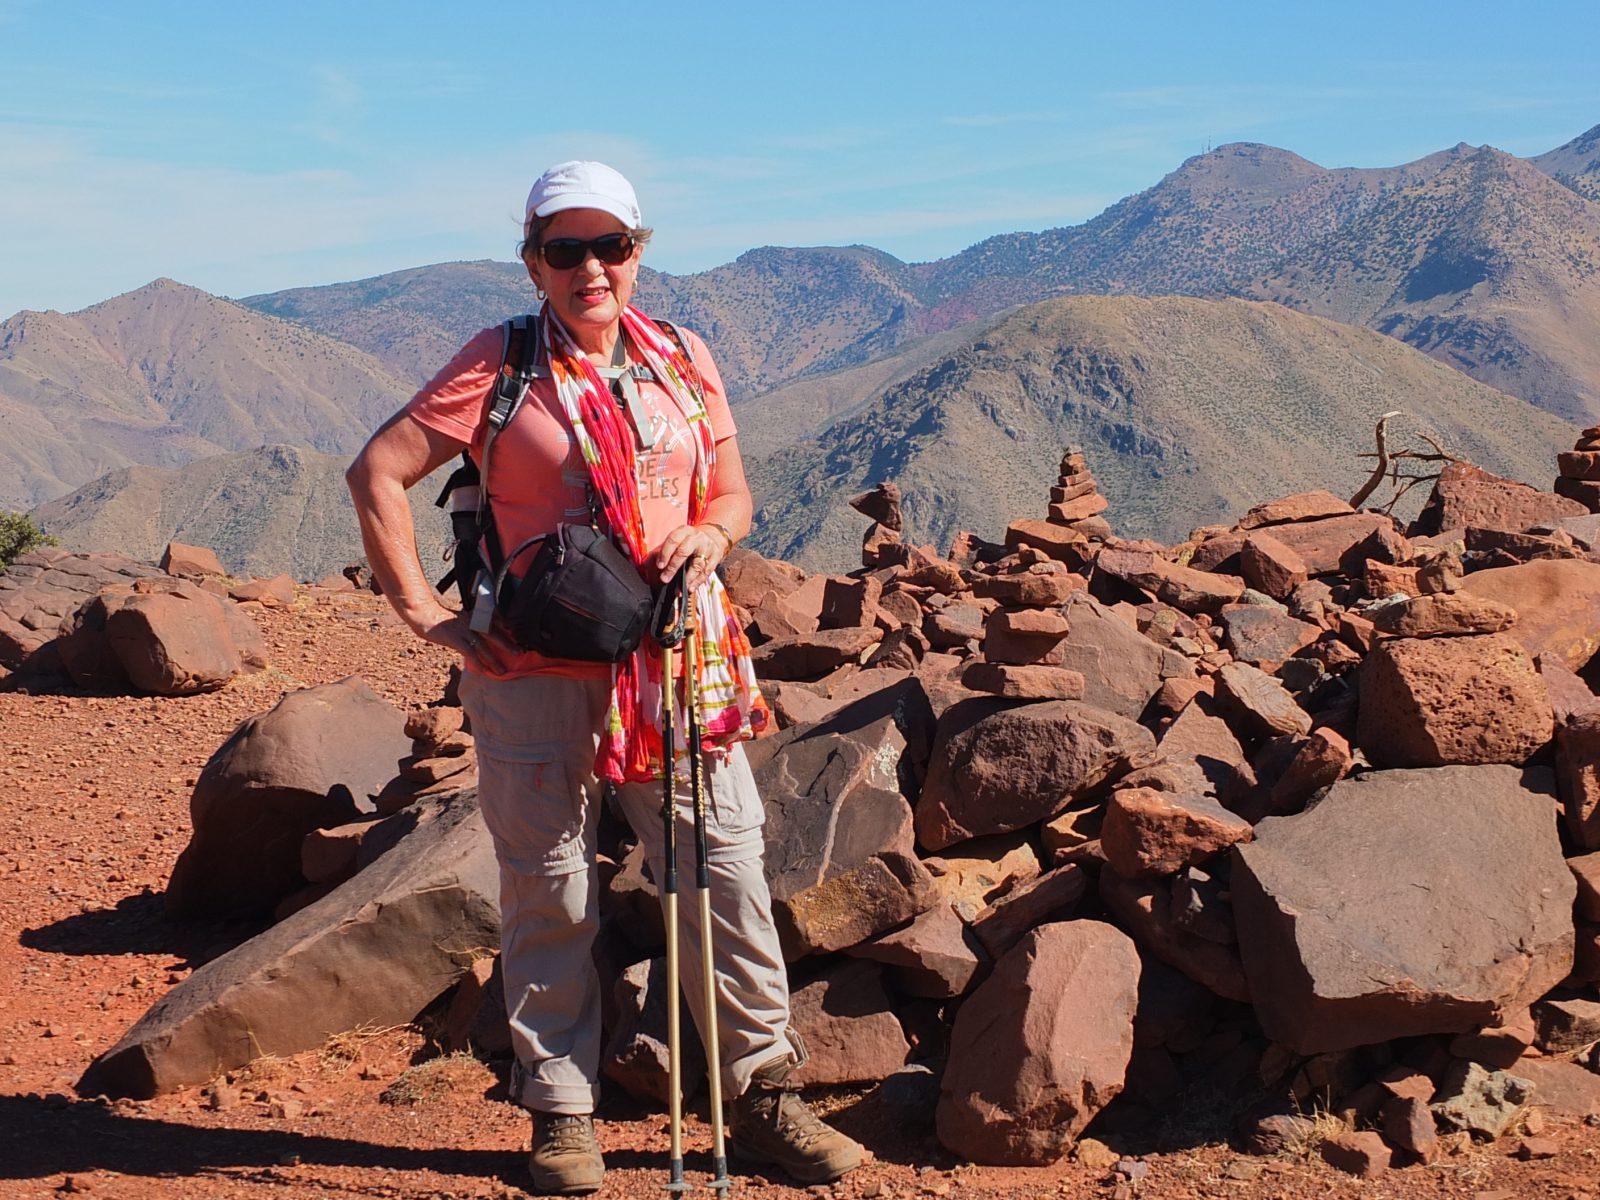 Dag 5 - Marokko Hoge Atlas wandelen 50+